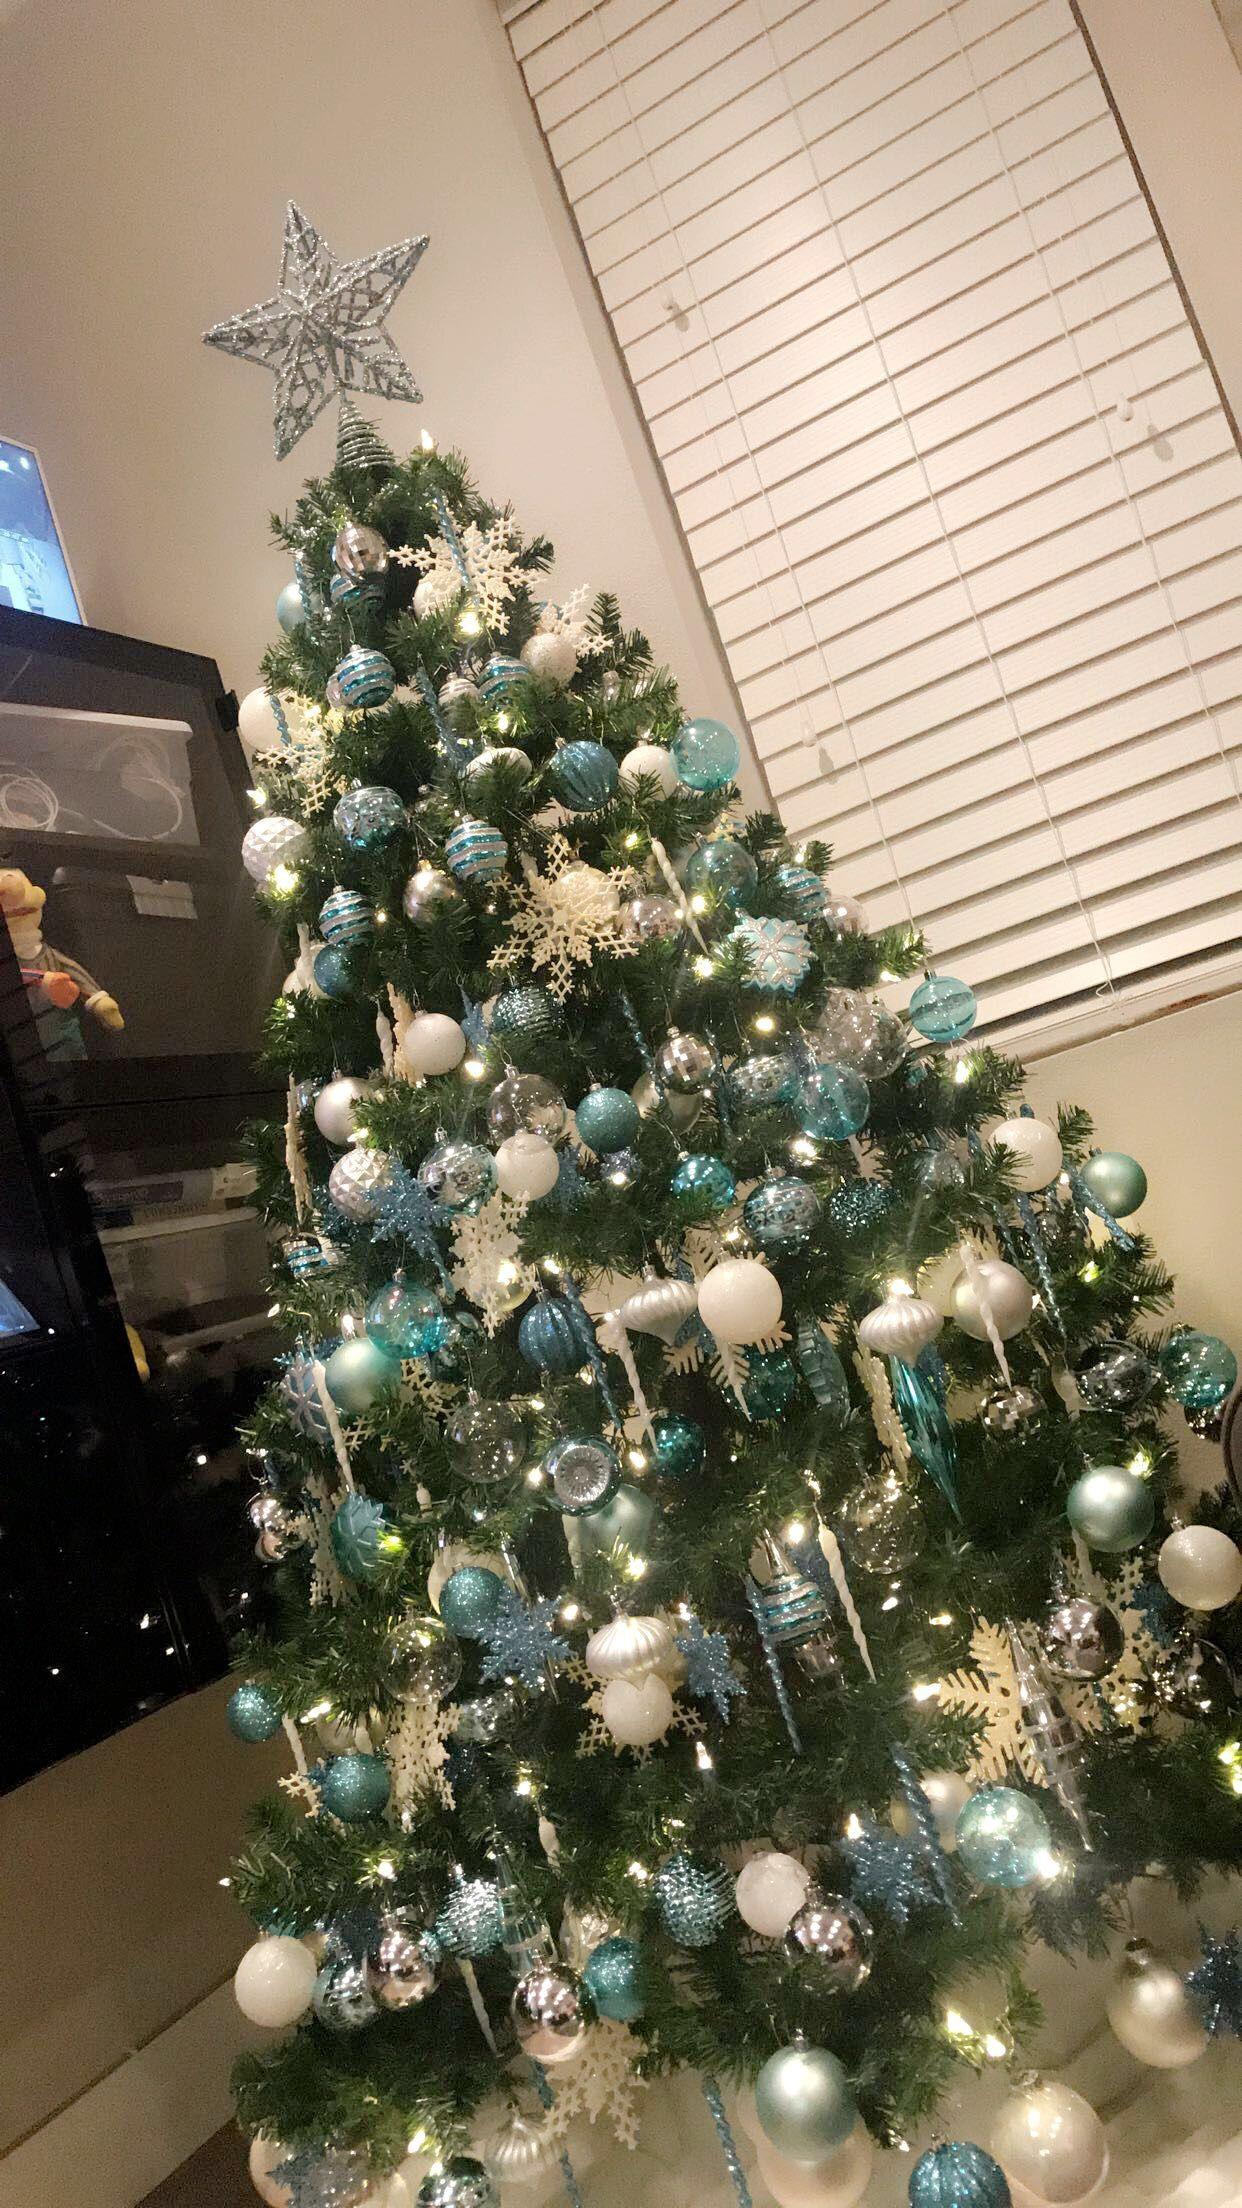 Winter Wonderland Christmas Christmas Decorations Holiday Ideas